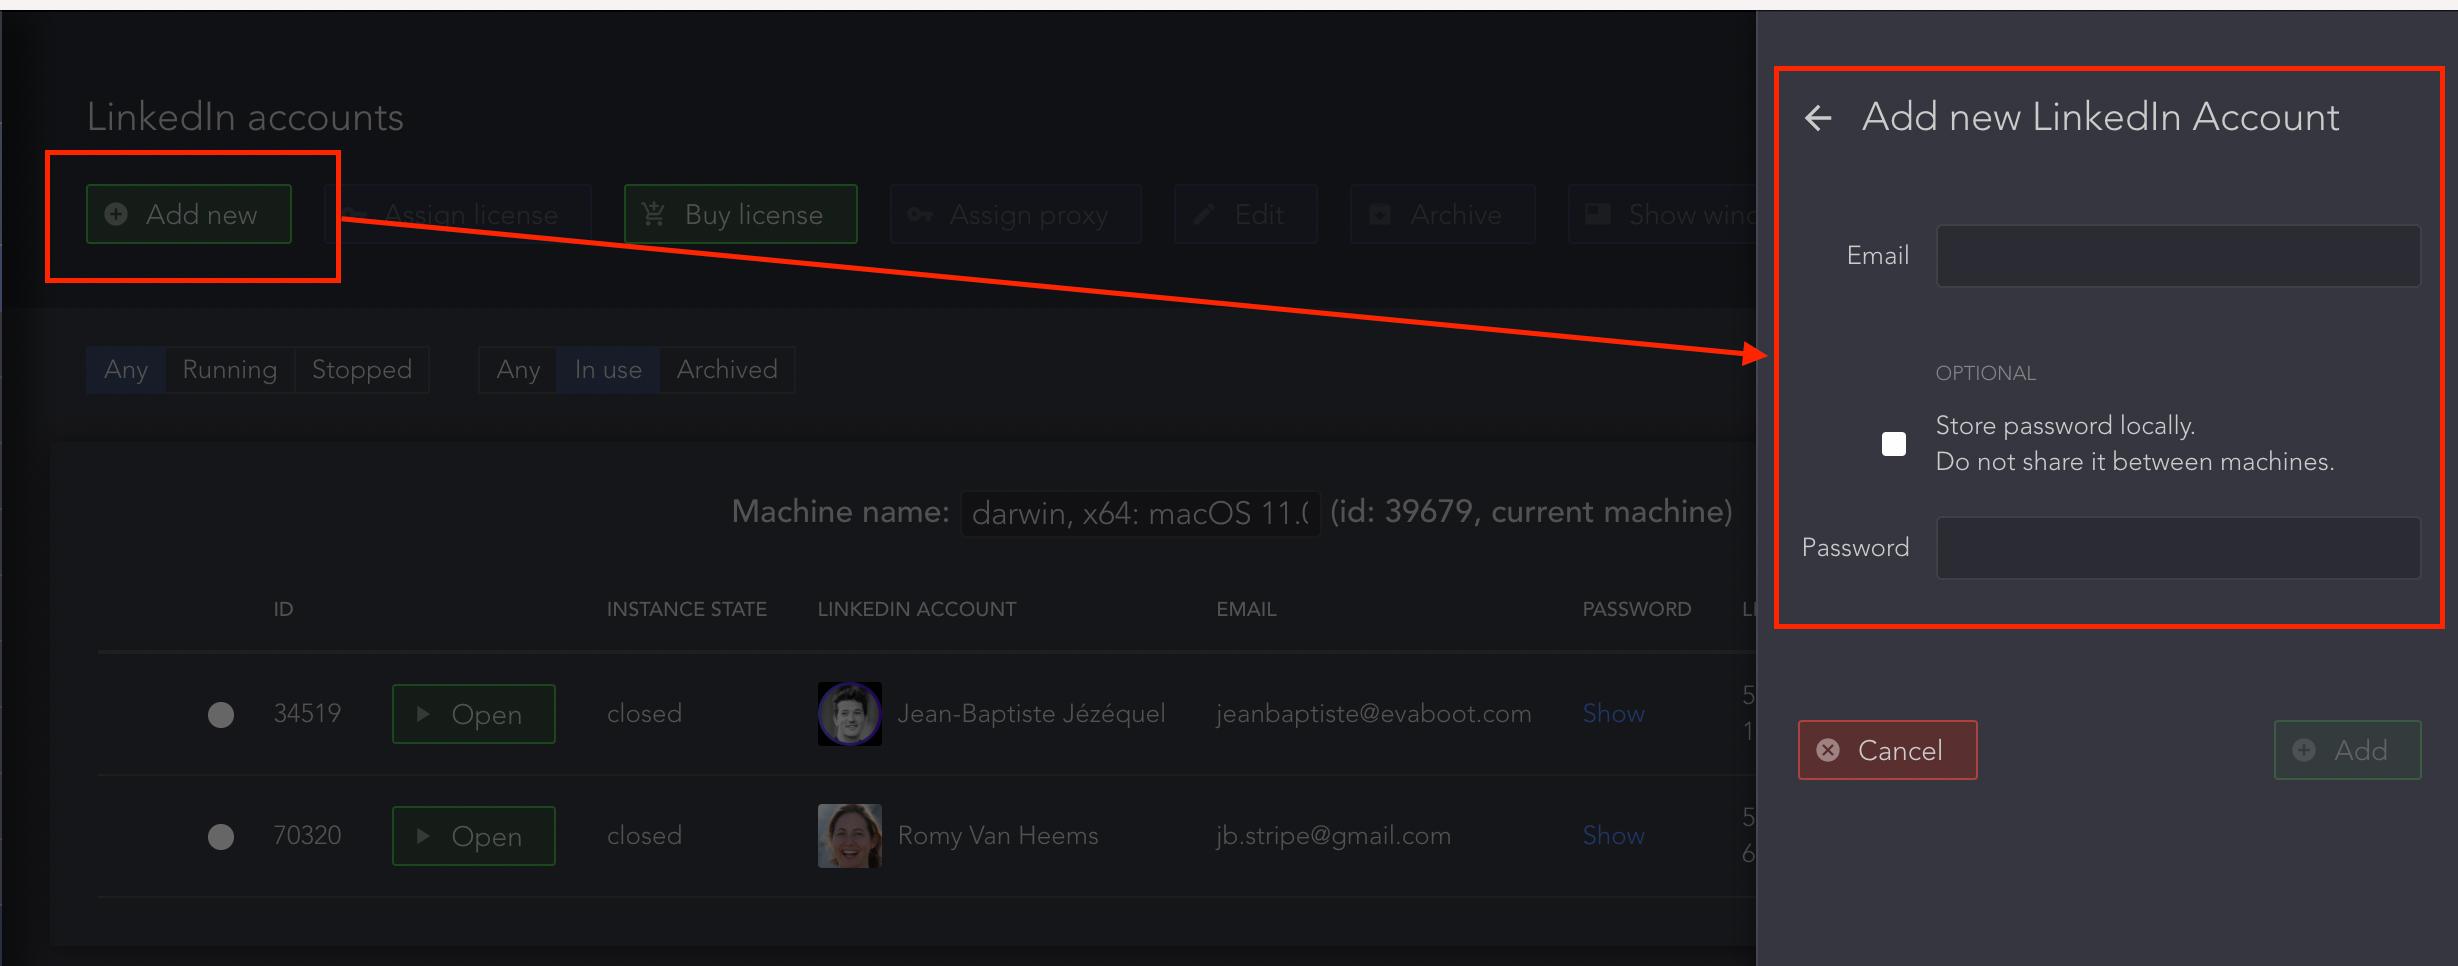 add-a-new-account-linkedin-helper.png